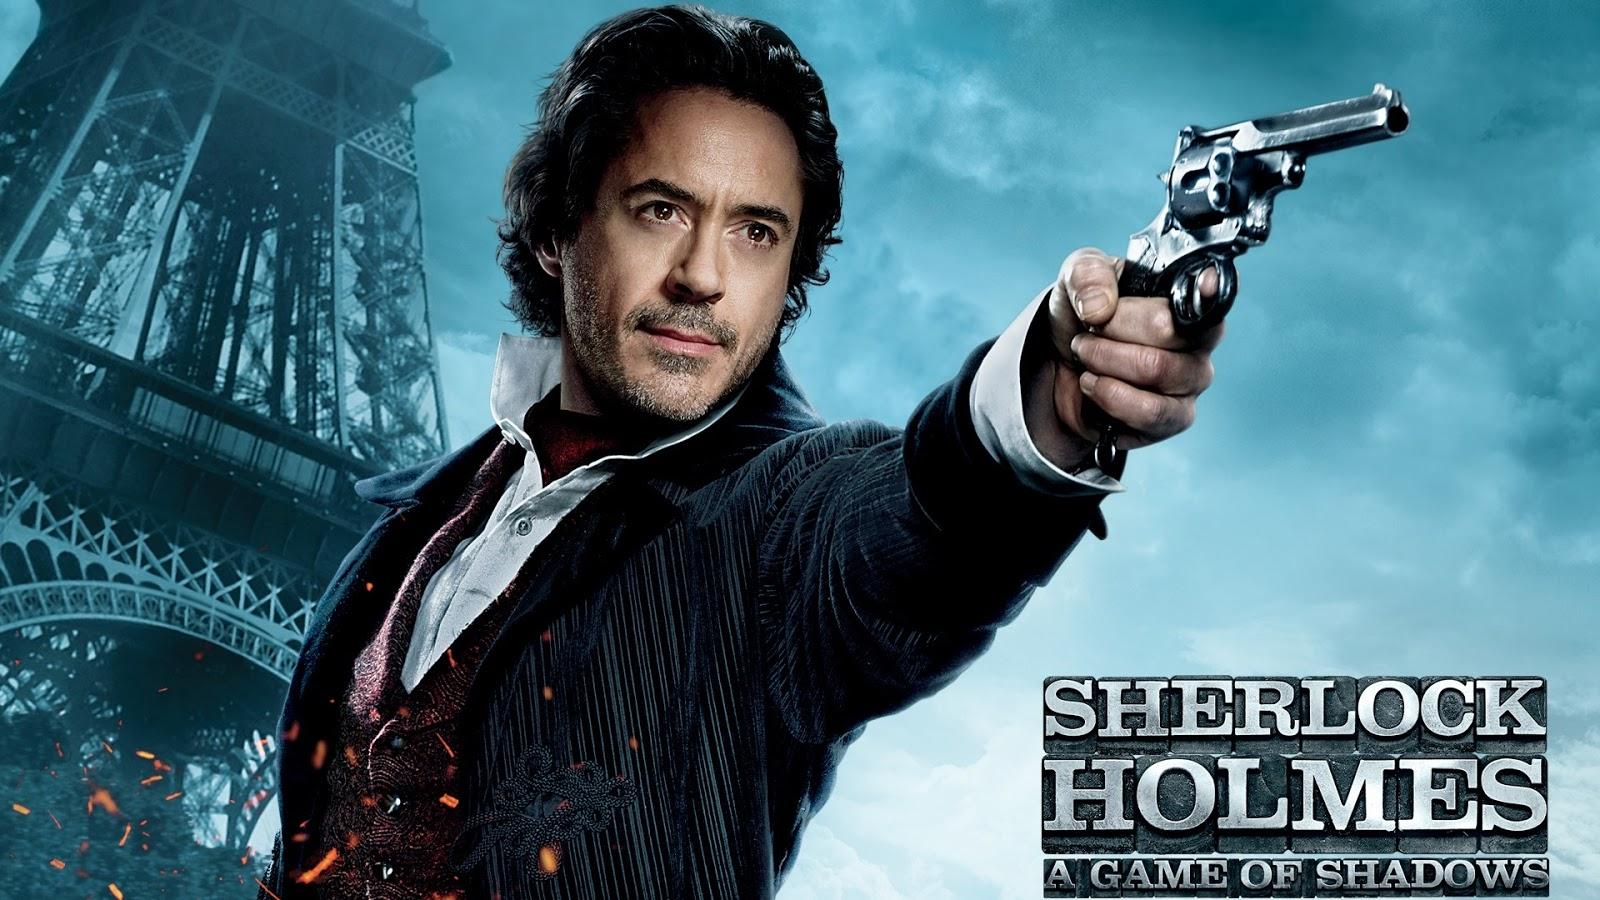 http://4.bp.blogspot.com/-YQUda9yOGSg/TvmV_XMu4aI/AAAAAAAAAEA/SYx2YvfmPuY/s1600/Sherlock-Holmes-Movie-desktop-HD-wallpaper.jpg